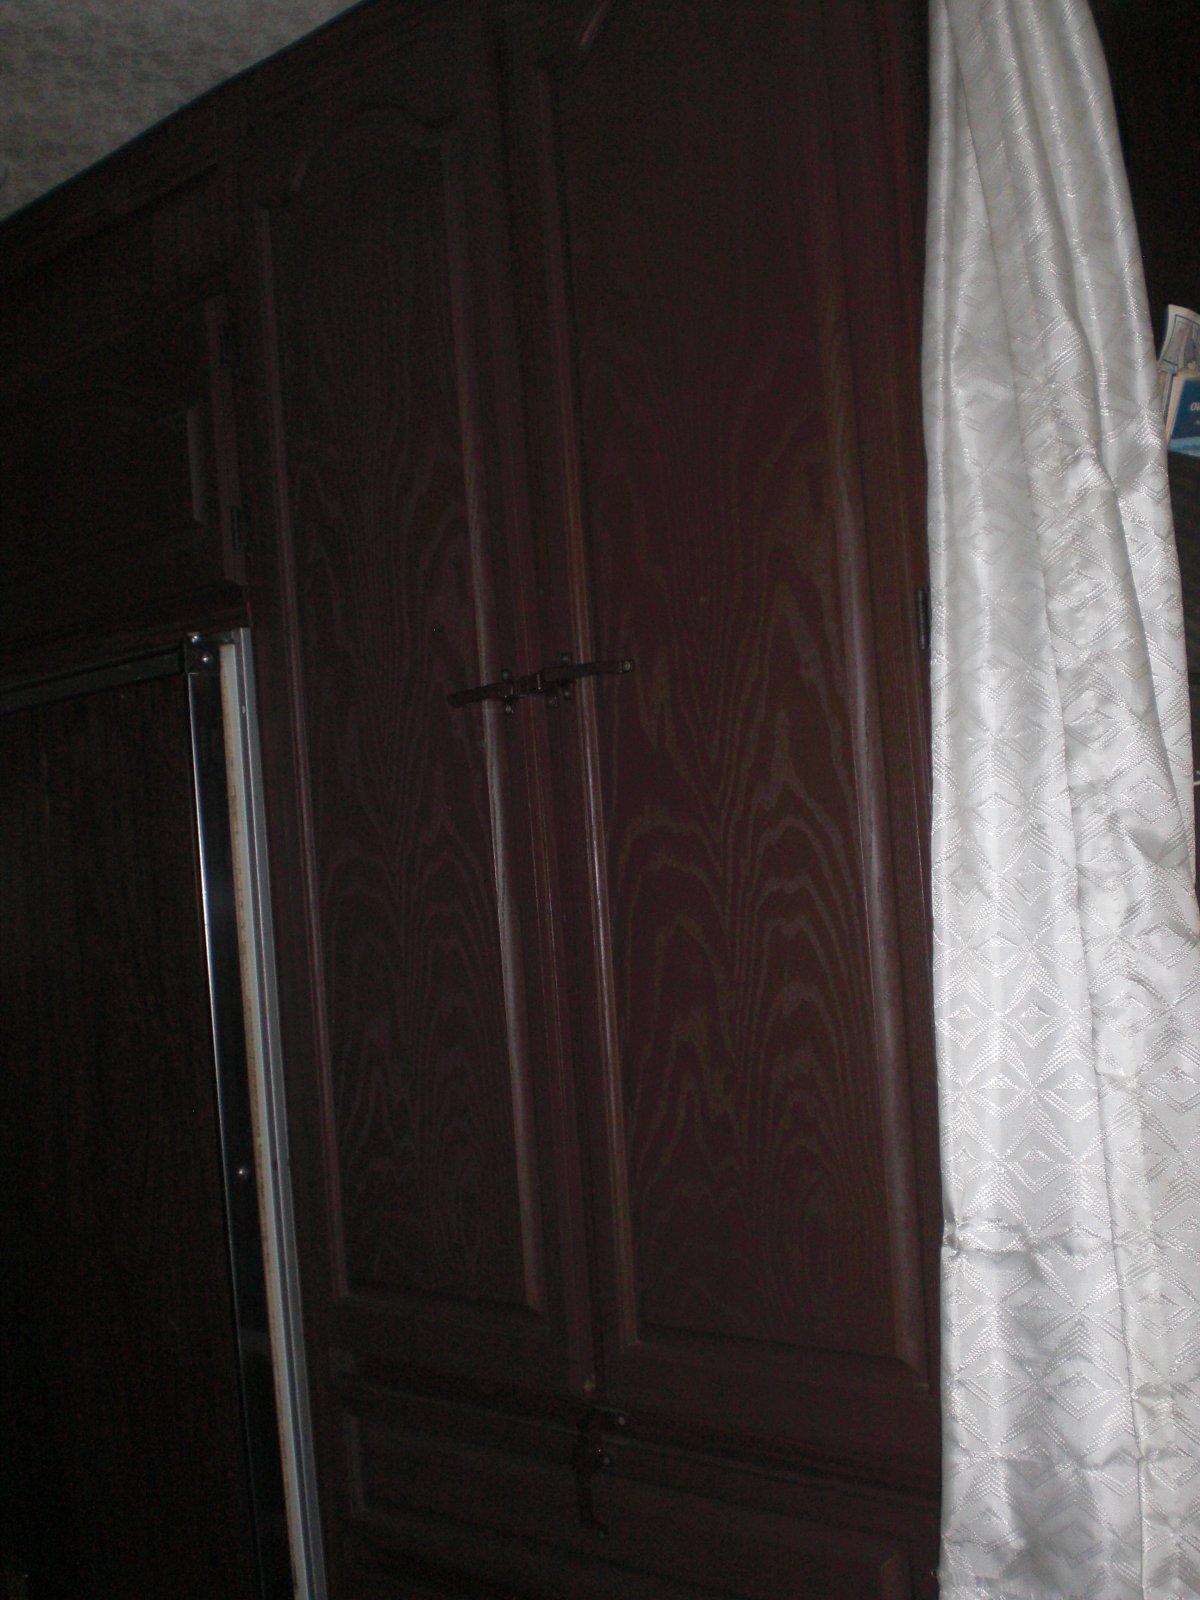 Click image for larger version  Name:closet door.jpg Views:67 Size:240.9 KB ID:9775